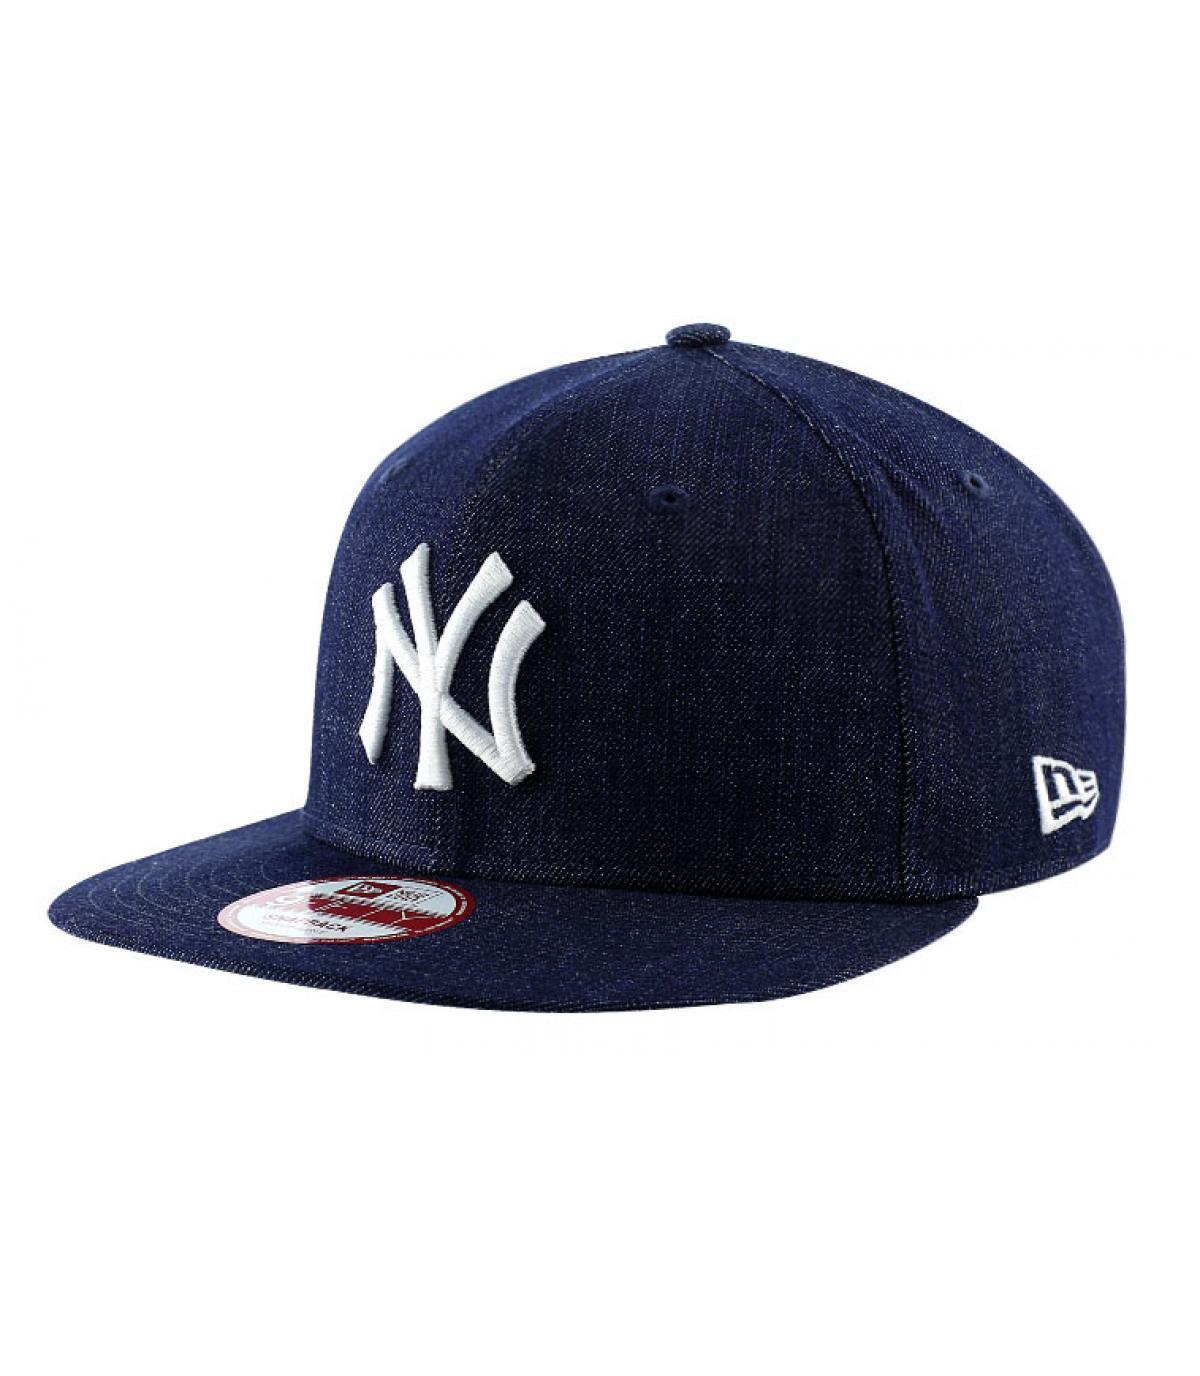 Détails Snapback NY MLB denim basic - image 2